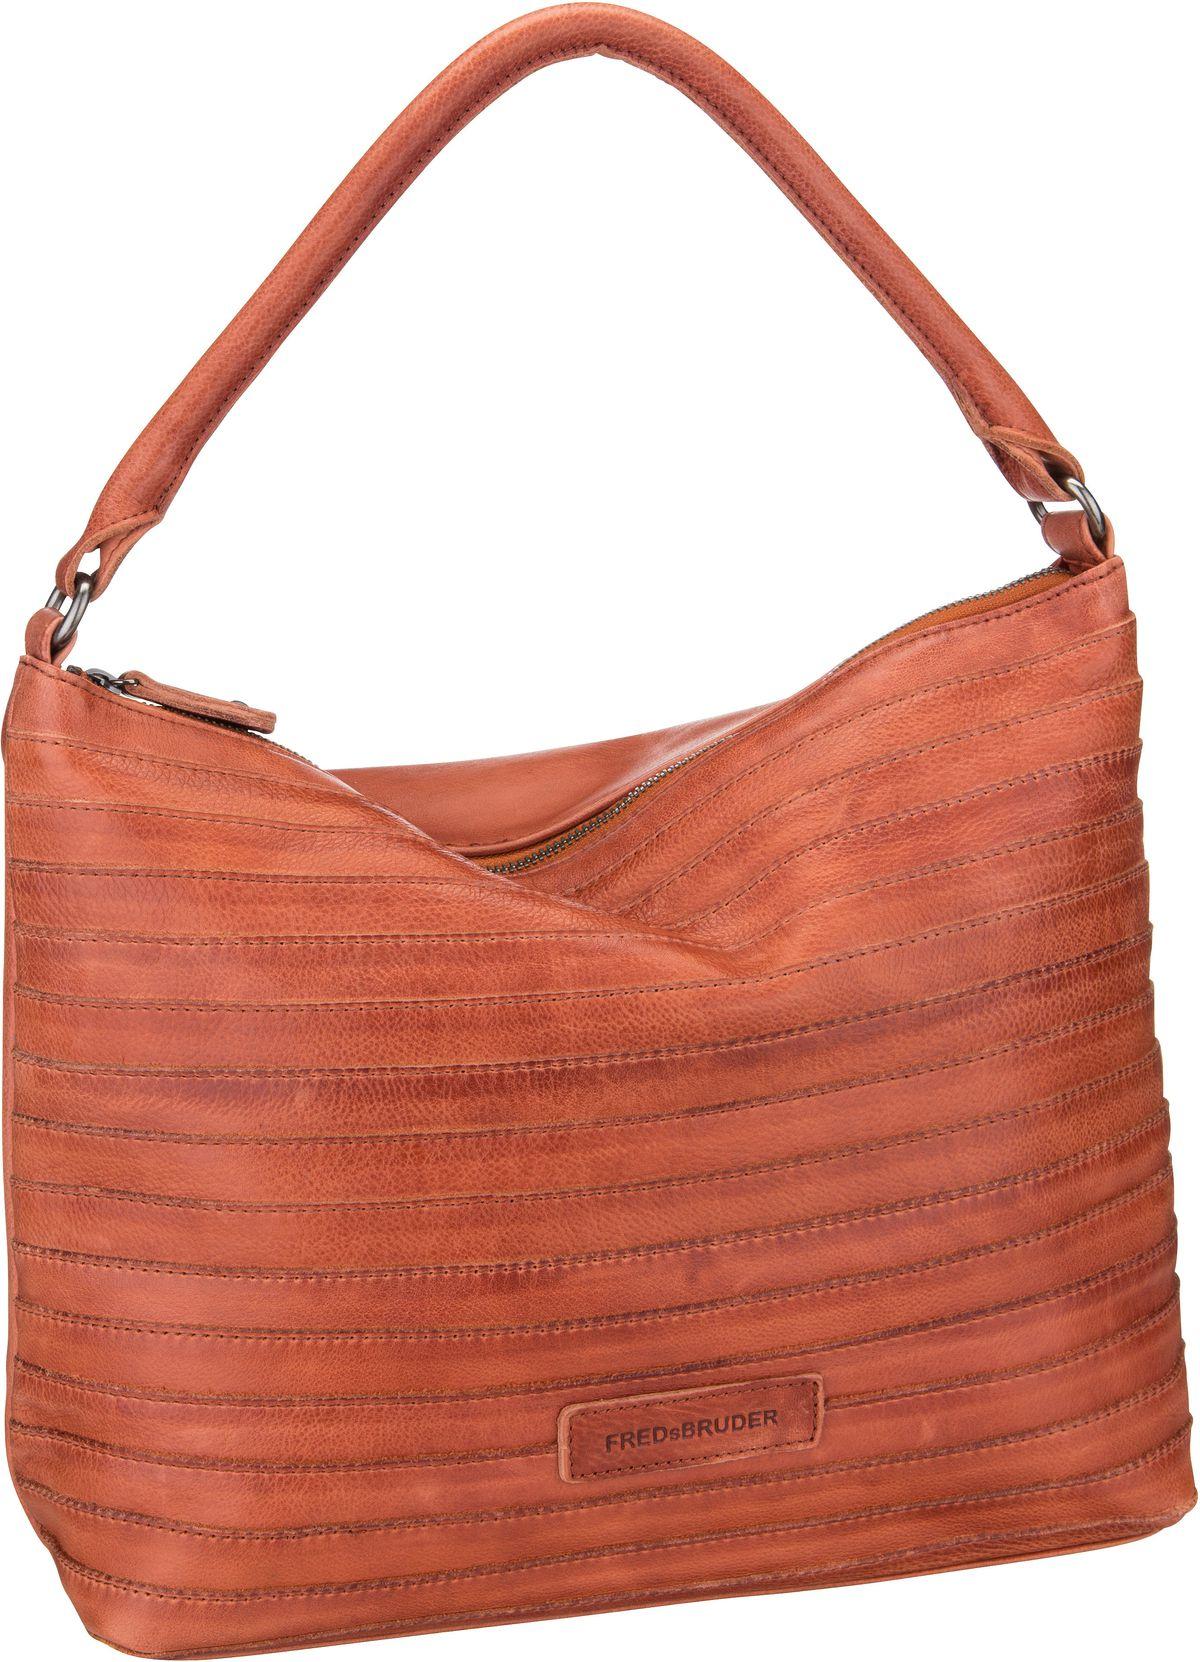 Handtasche Schnuckelchen Rustic Orange